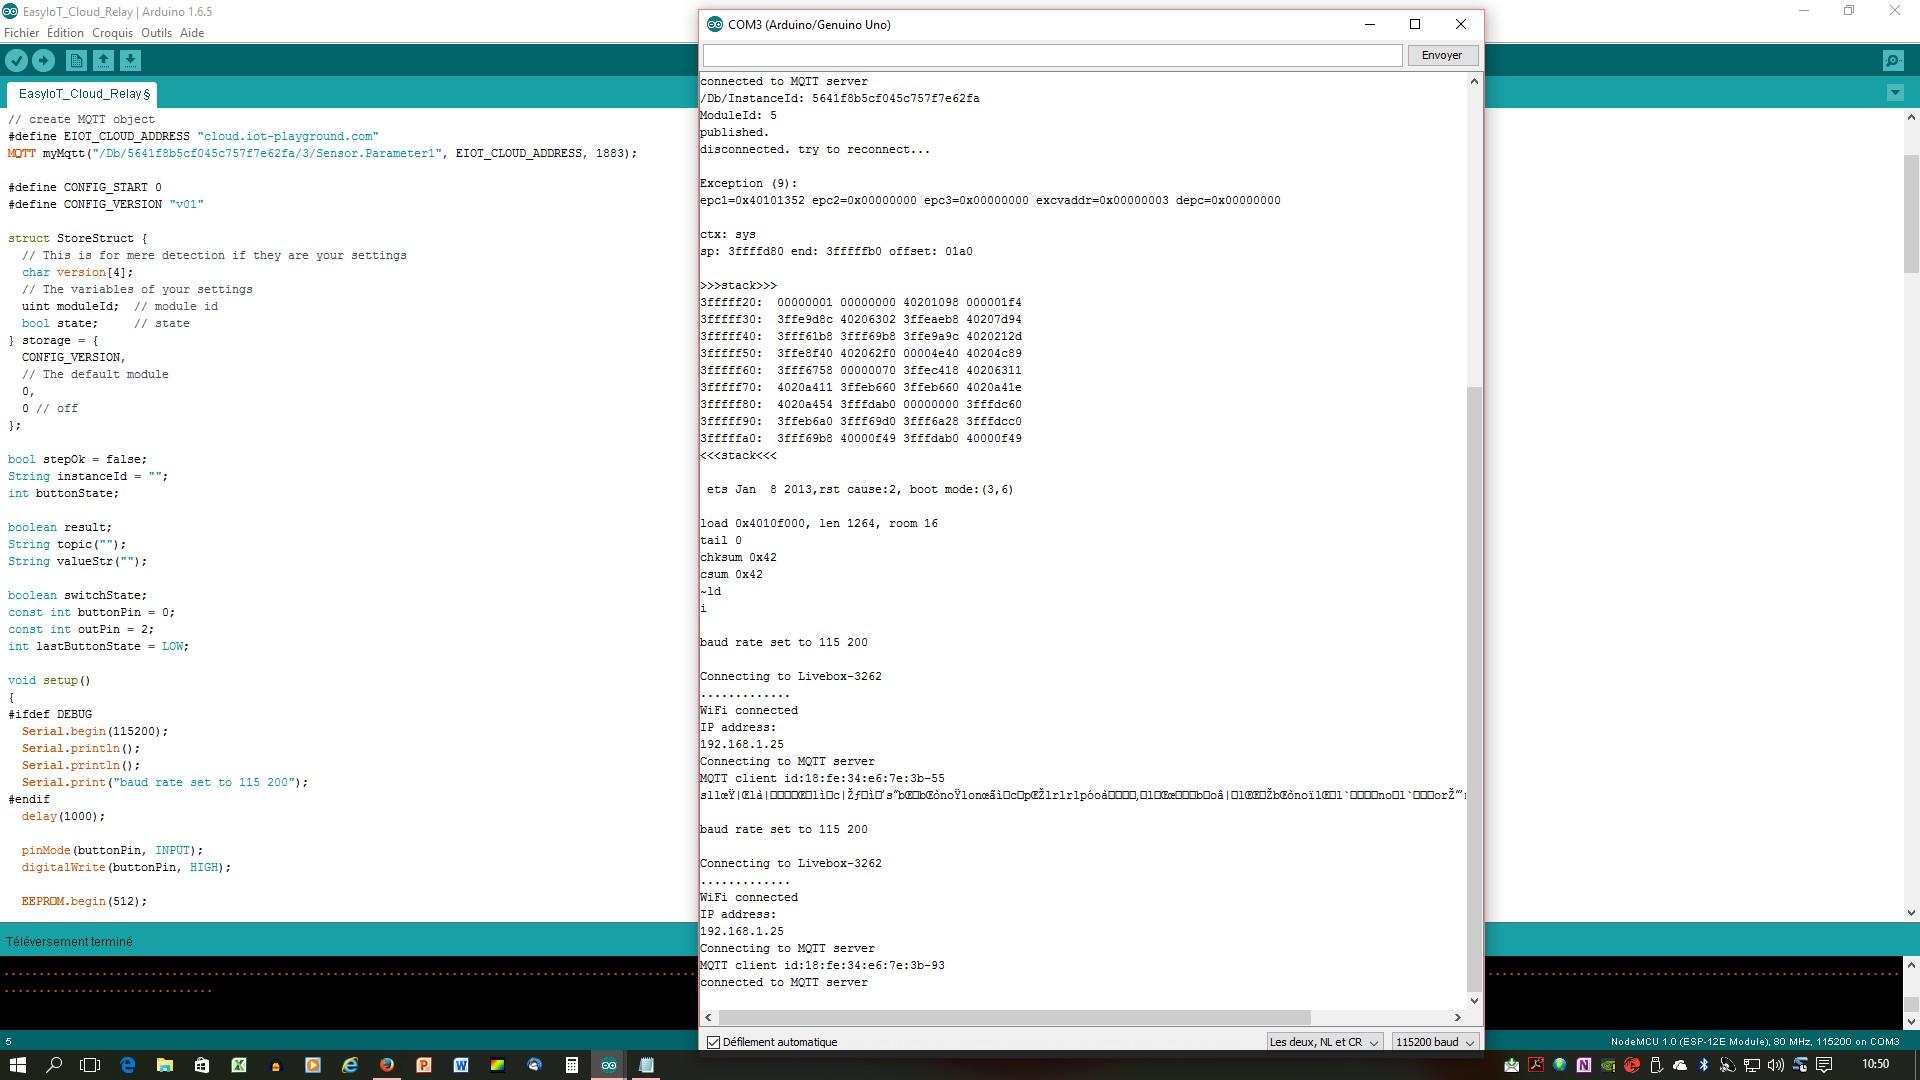 EasyIot_cloud_relay_pbld.jpg